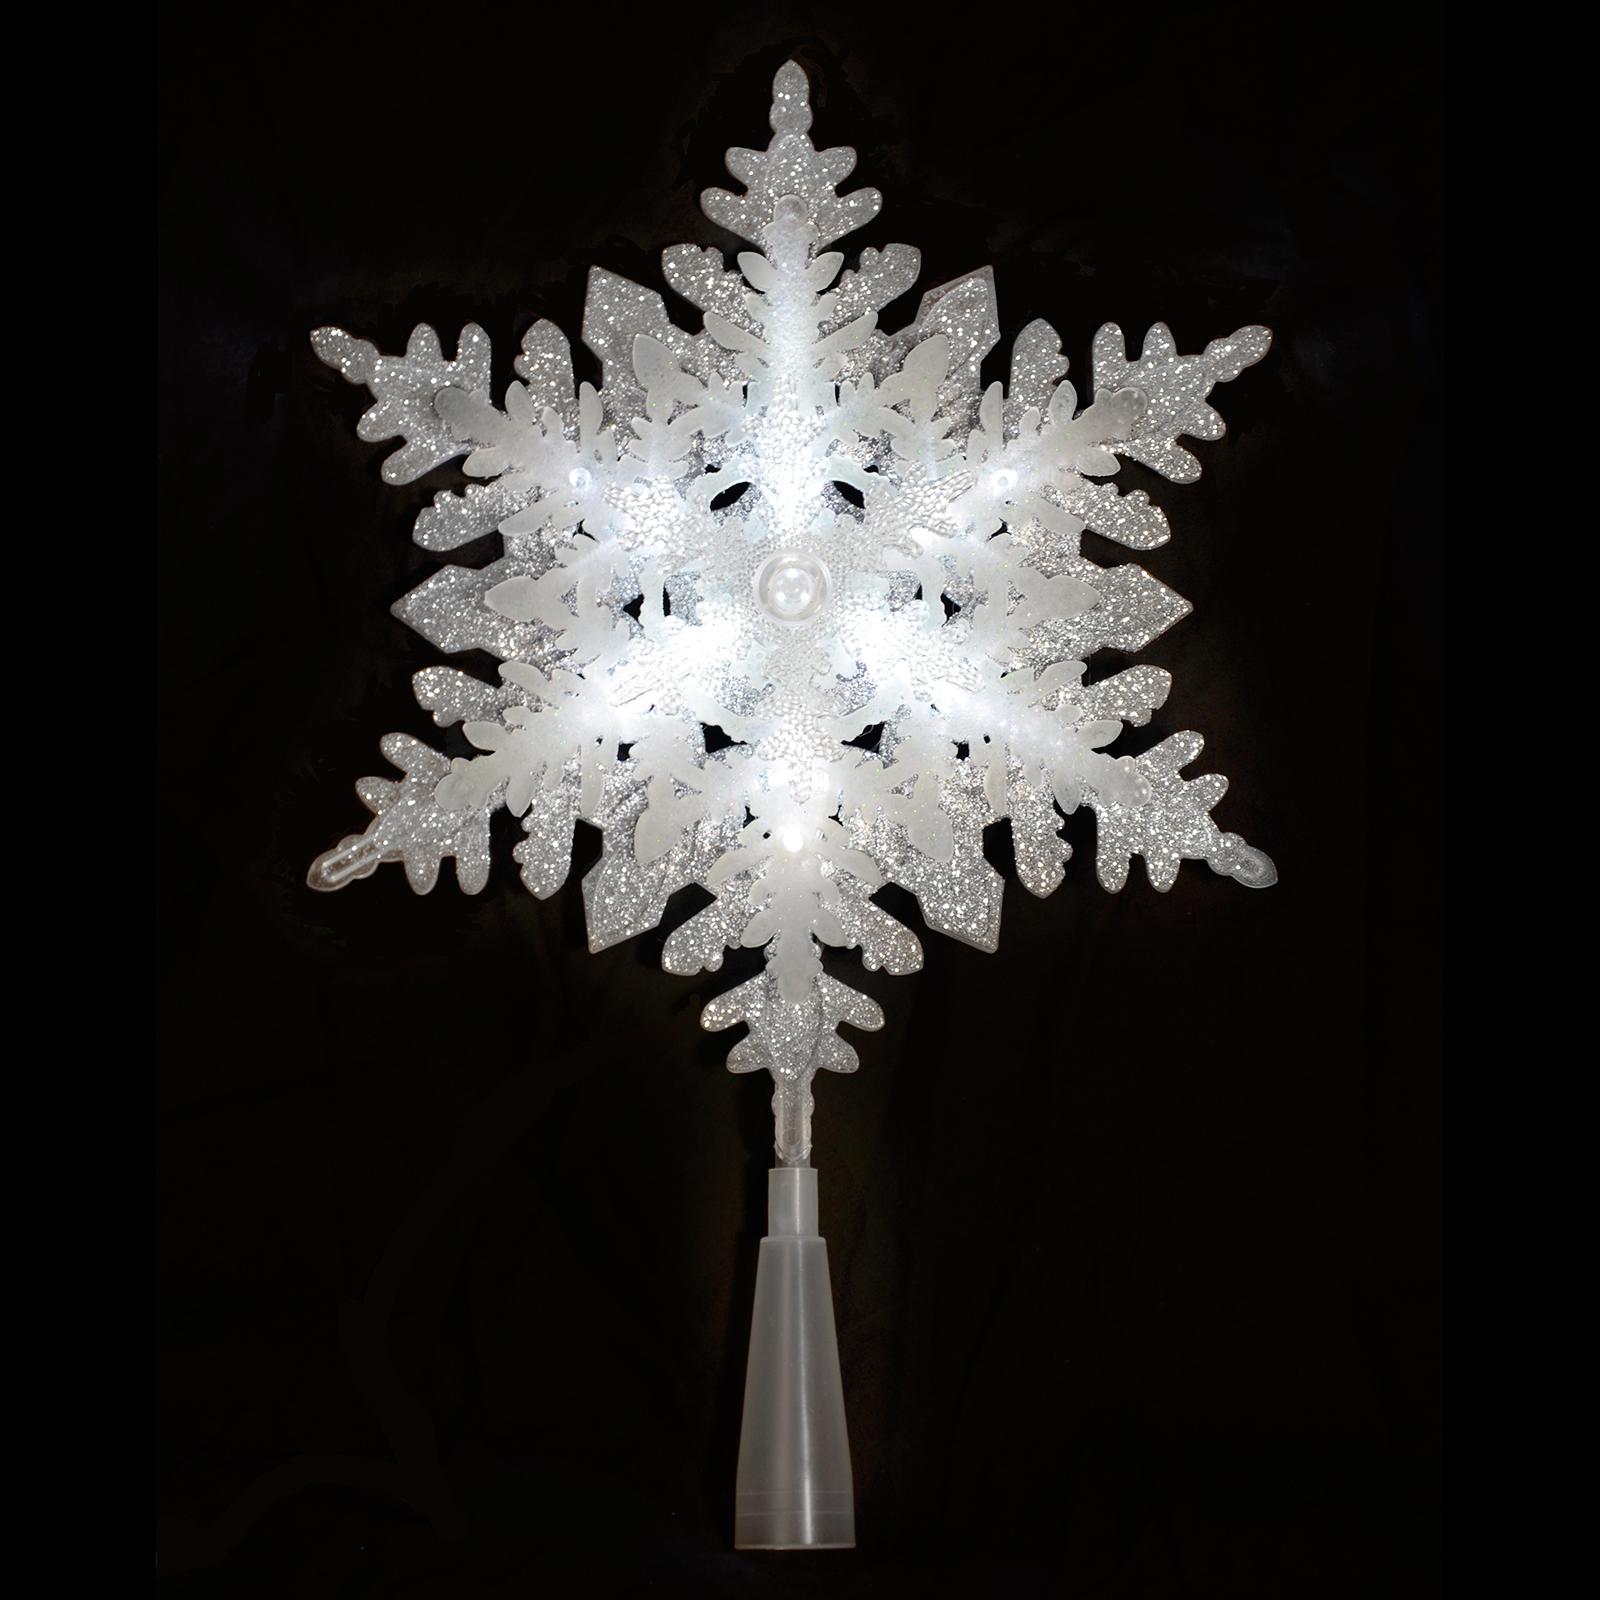 Light Up Silver Glitter Acrylic Snowflake Christmas Tree ...